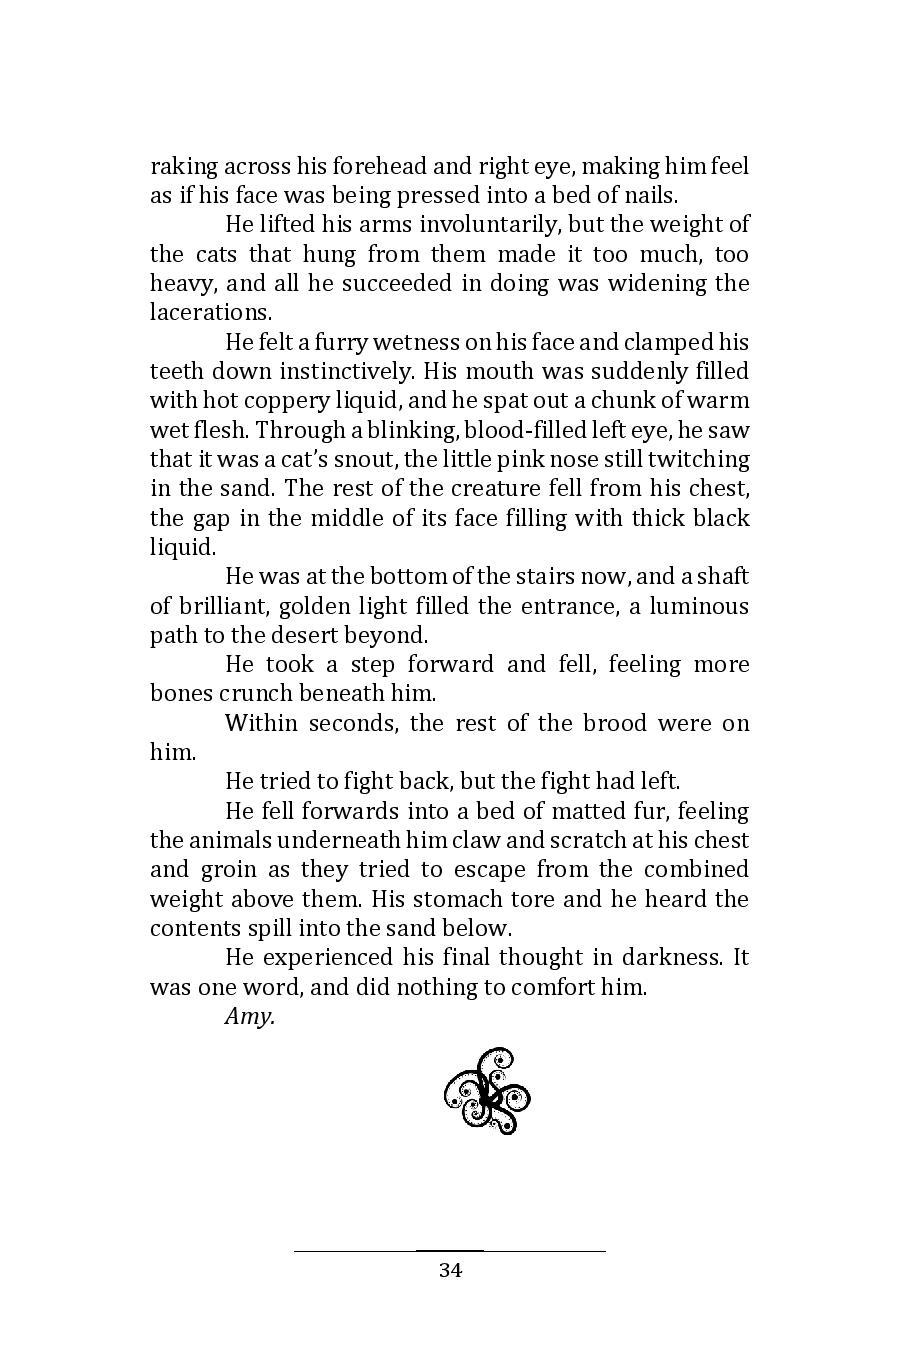 Hinnom Magazine 001 Manuscript 10-page-038